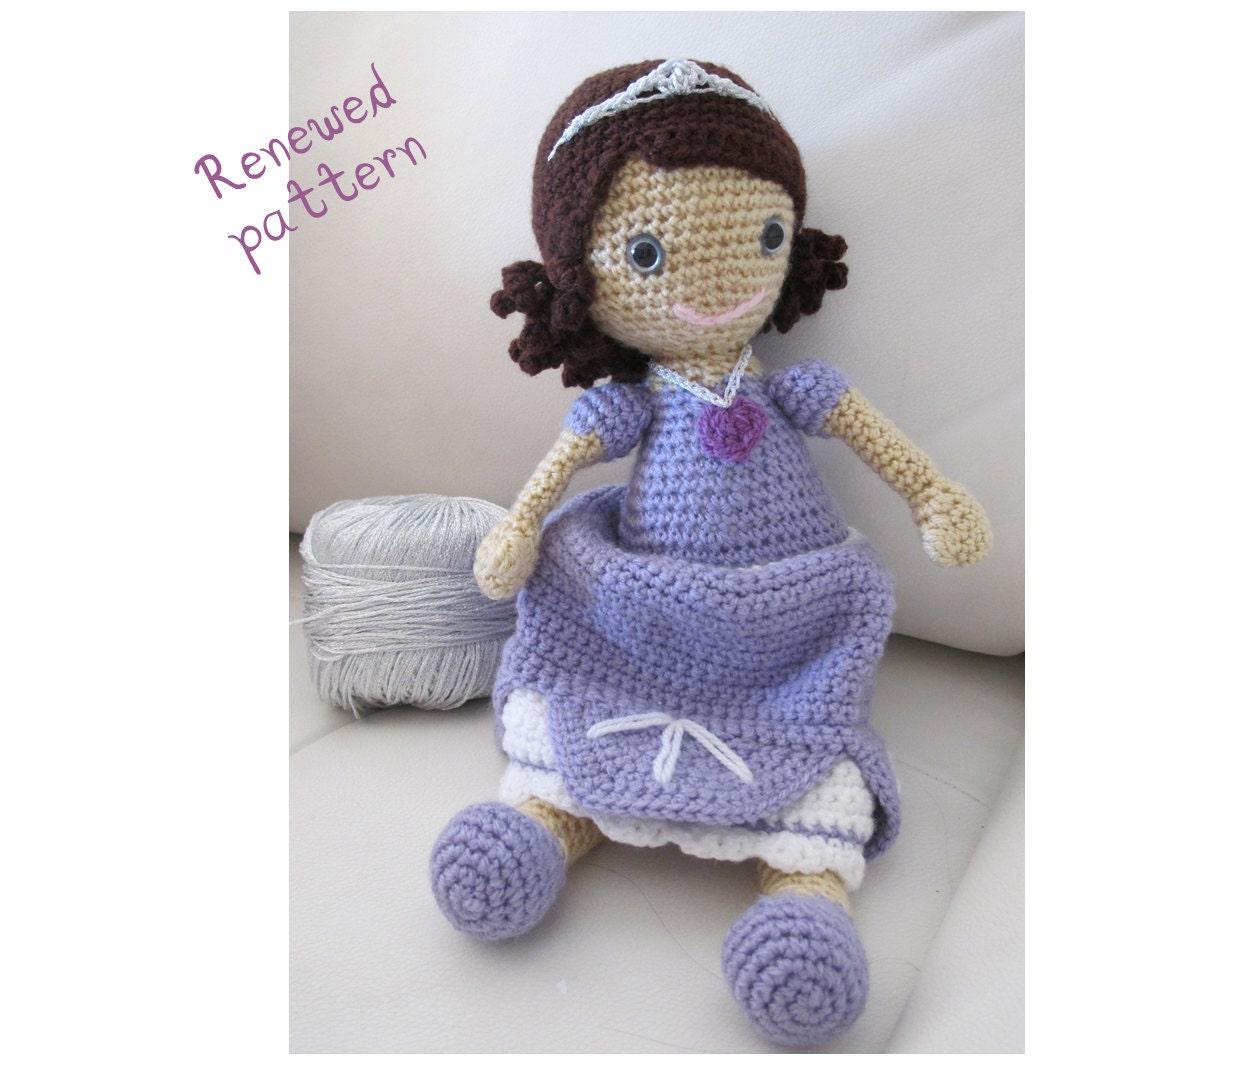 Amigurumi Star Wars Anleitung Kostenlos : Princess Sofia Crochet doll pattern Amigurumi pattern